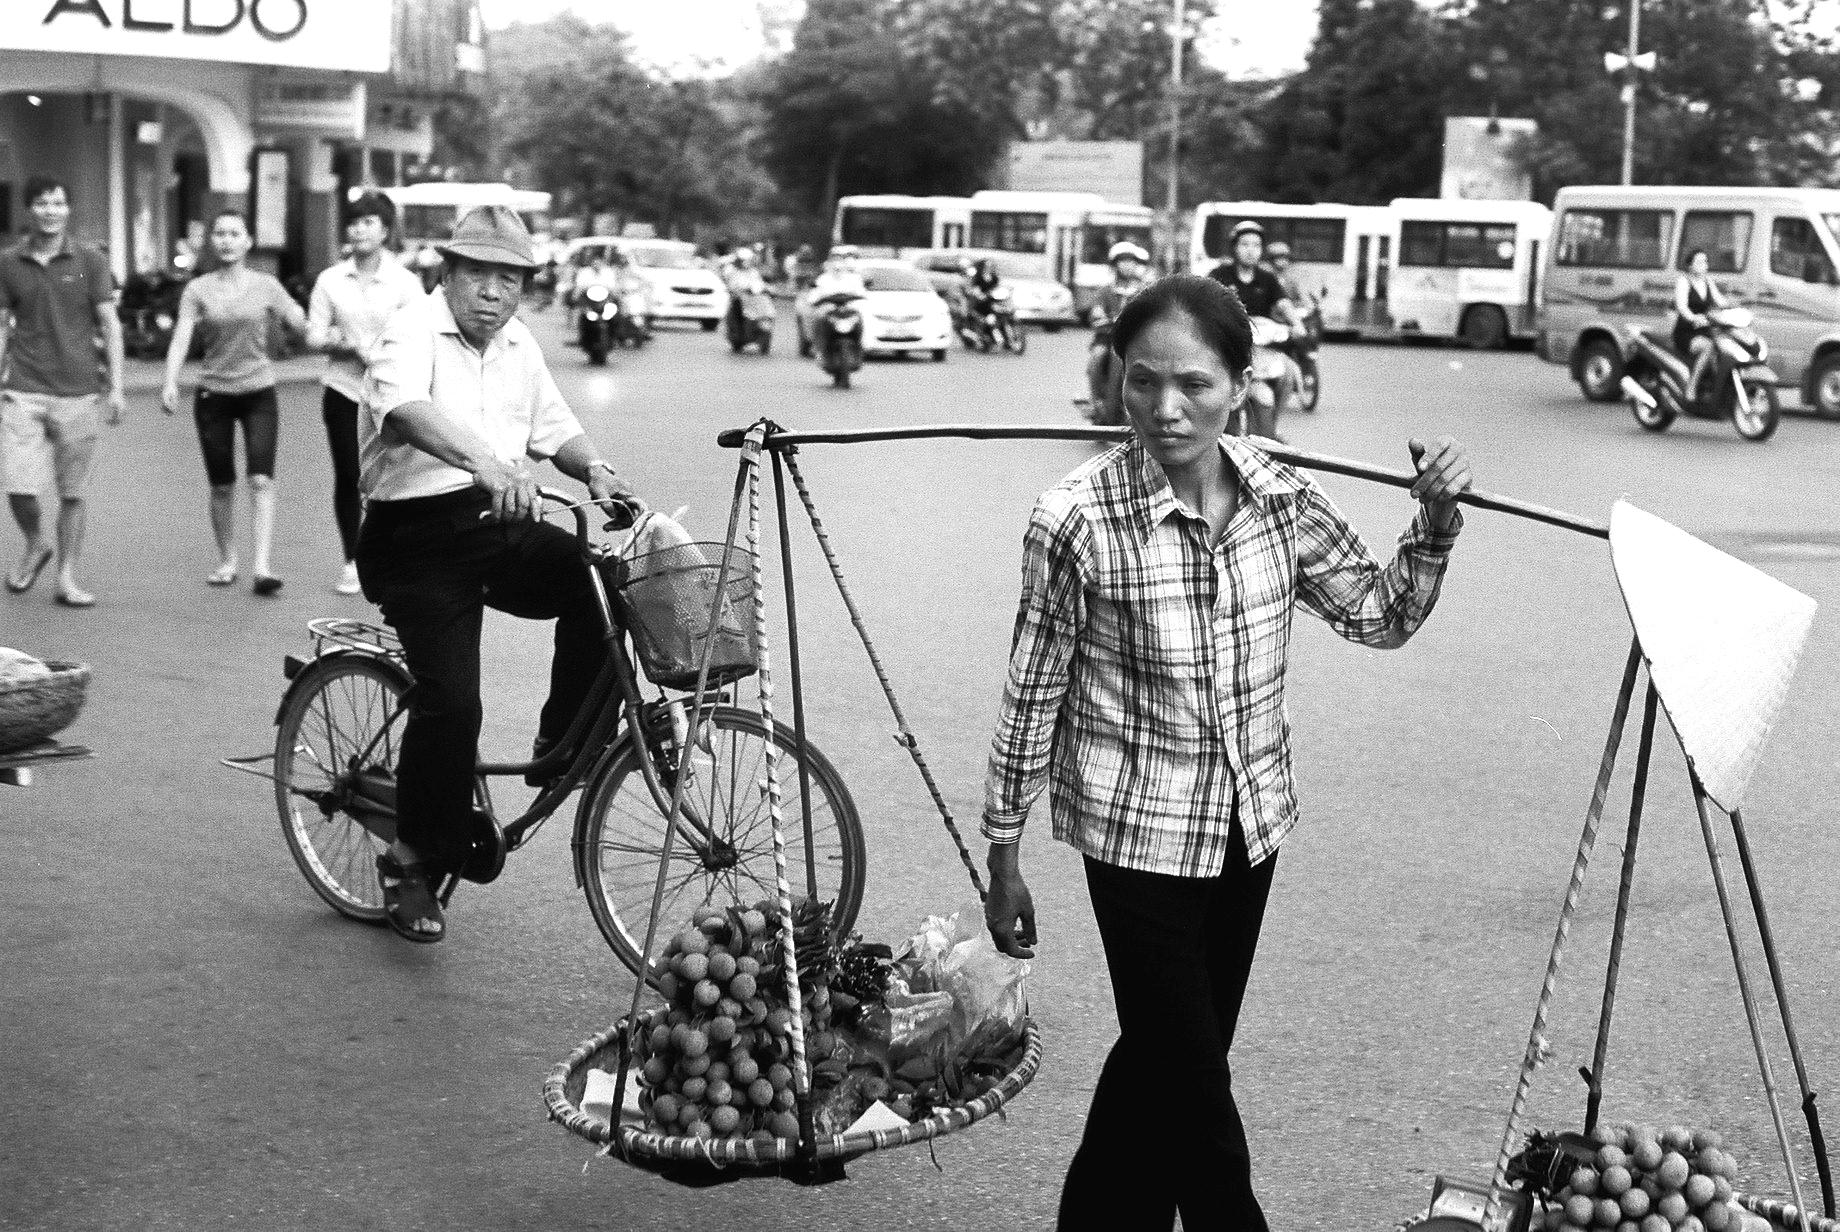 Hanoi Hustle, From Hanoi to Hoi An, 2013.